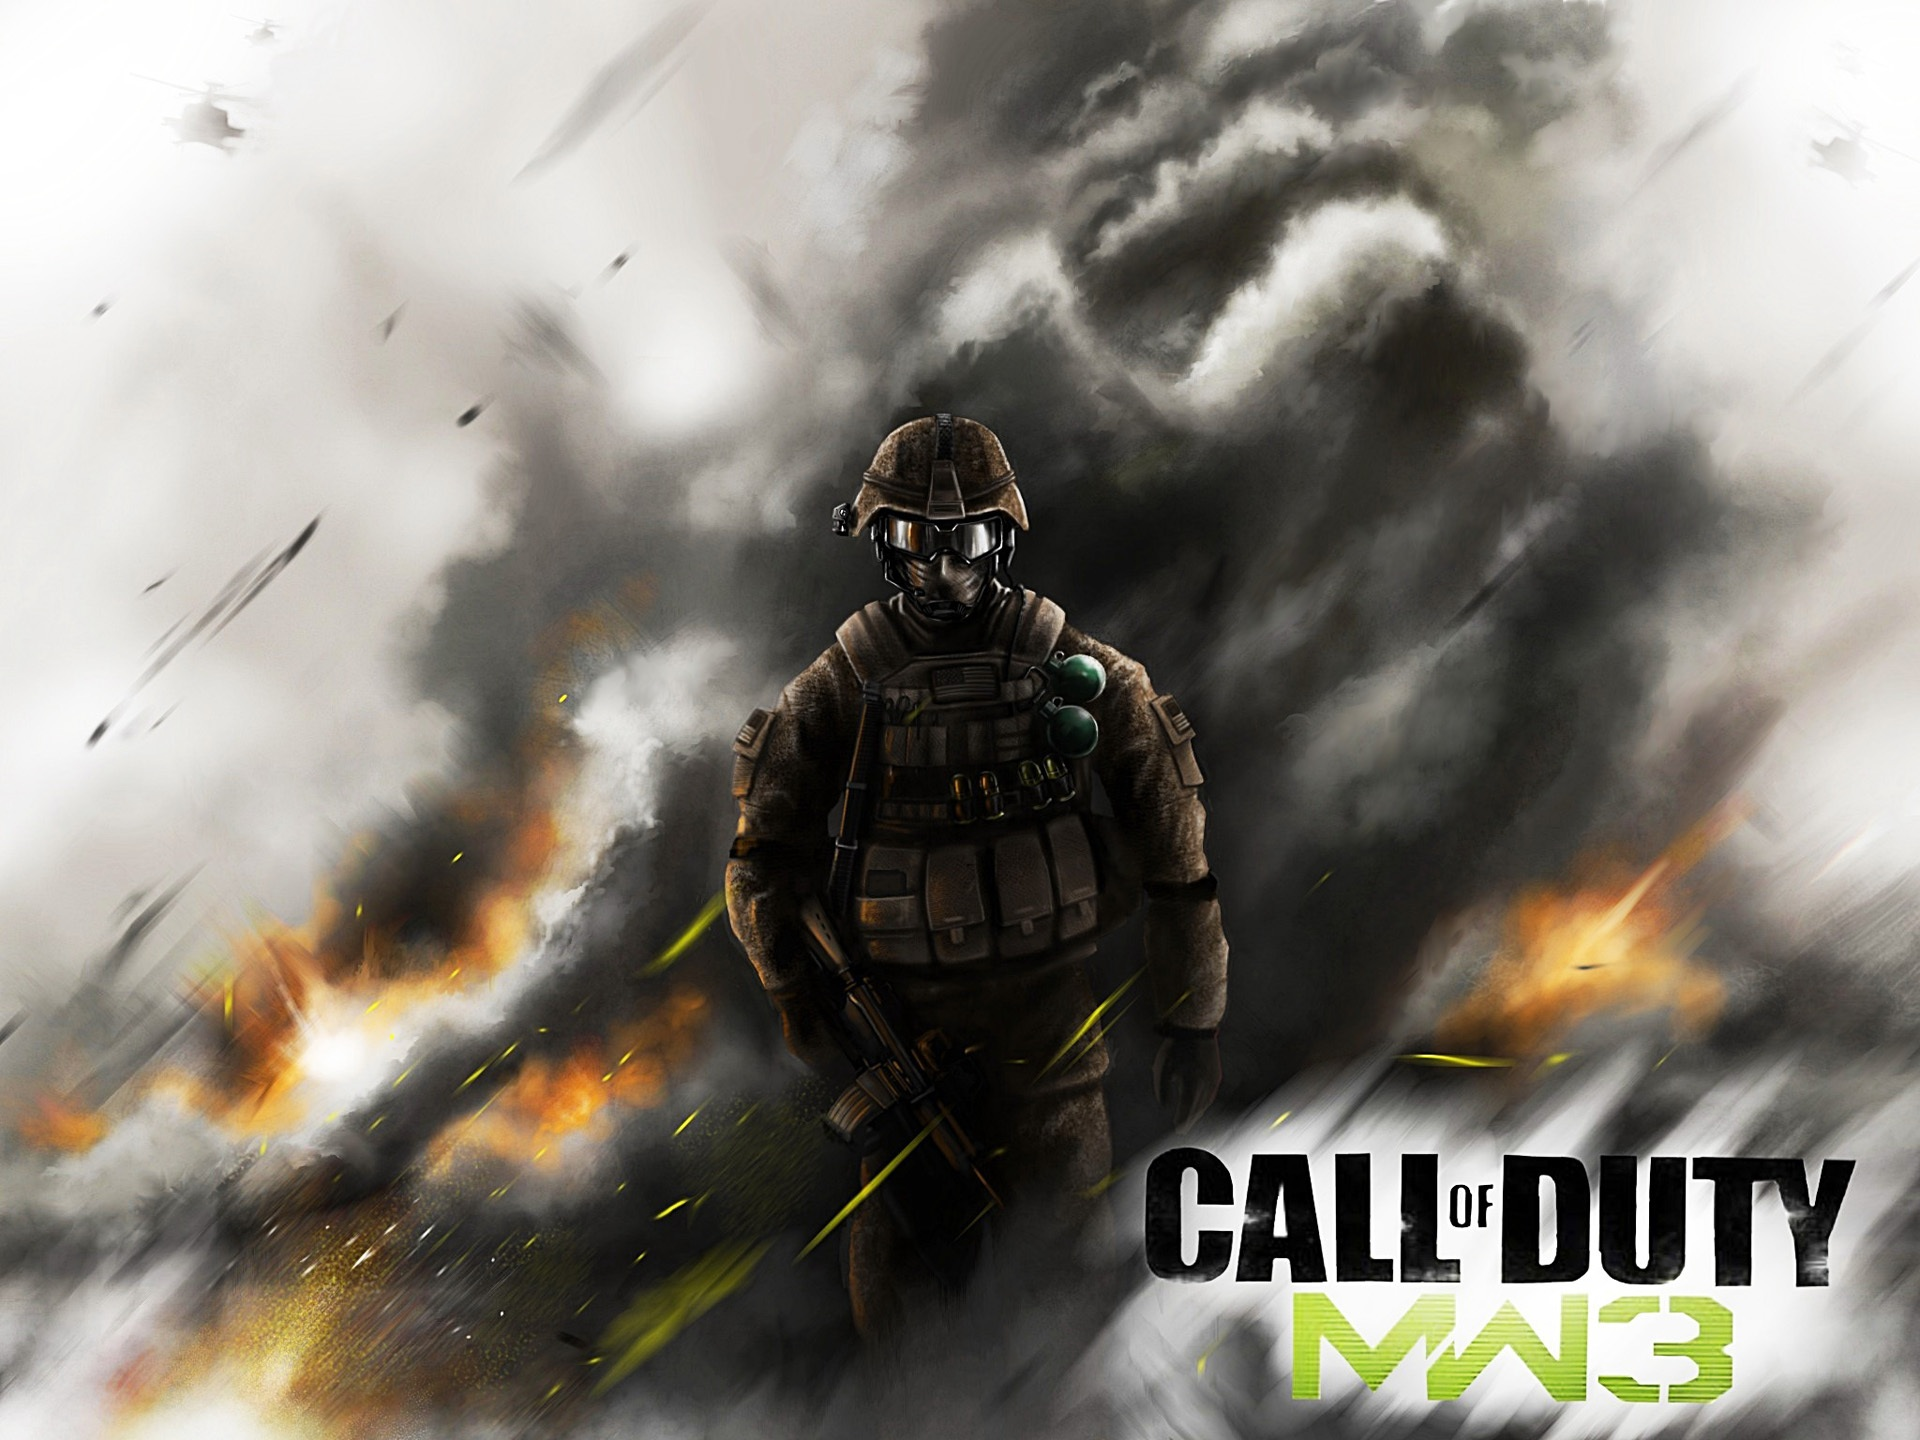 PC Call of Duty jogo: Modern Warfare 3 Papéis de Parede - 1920x1440